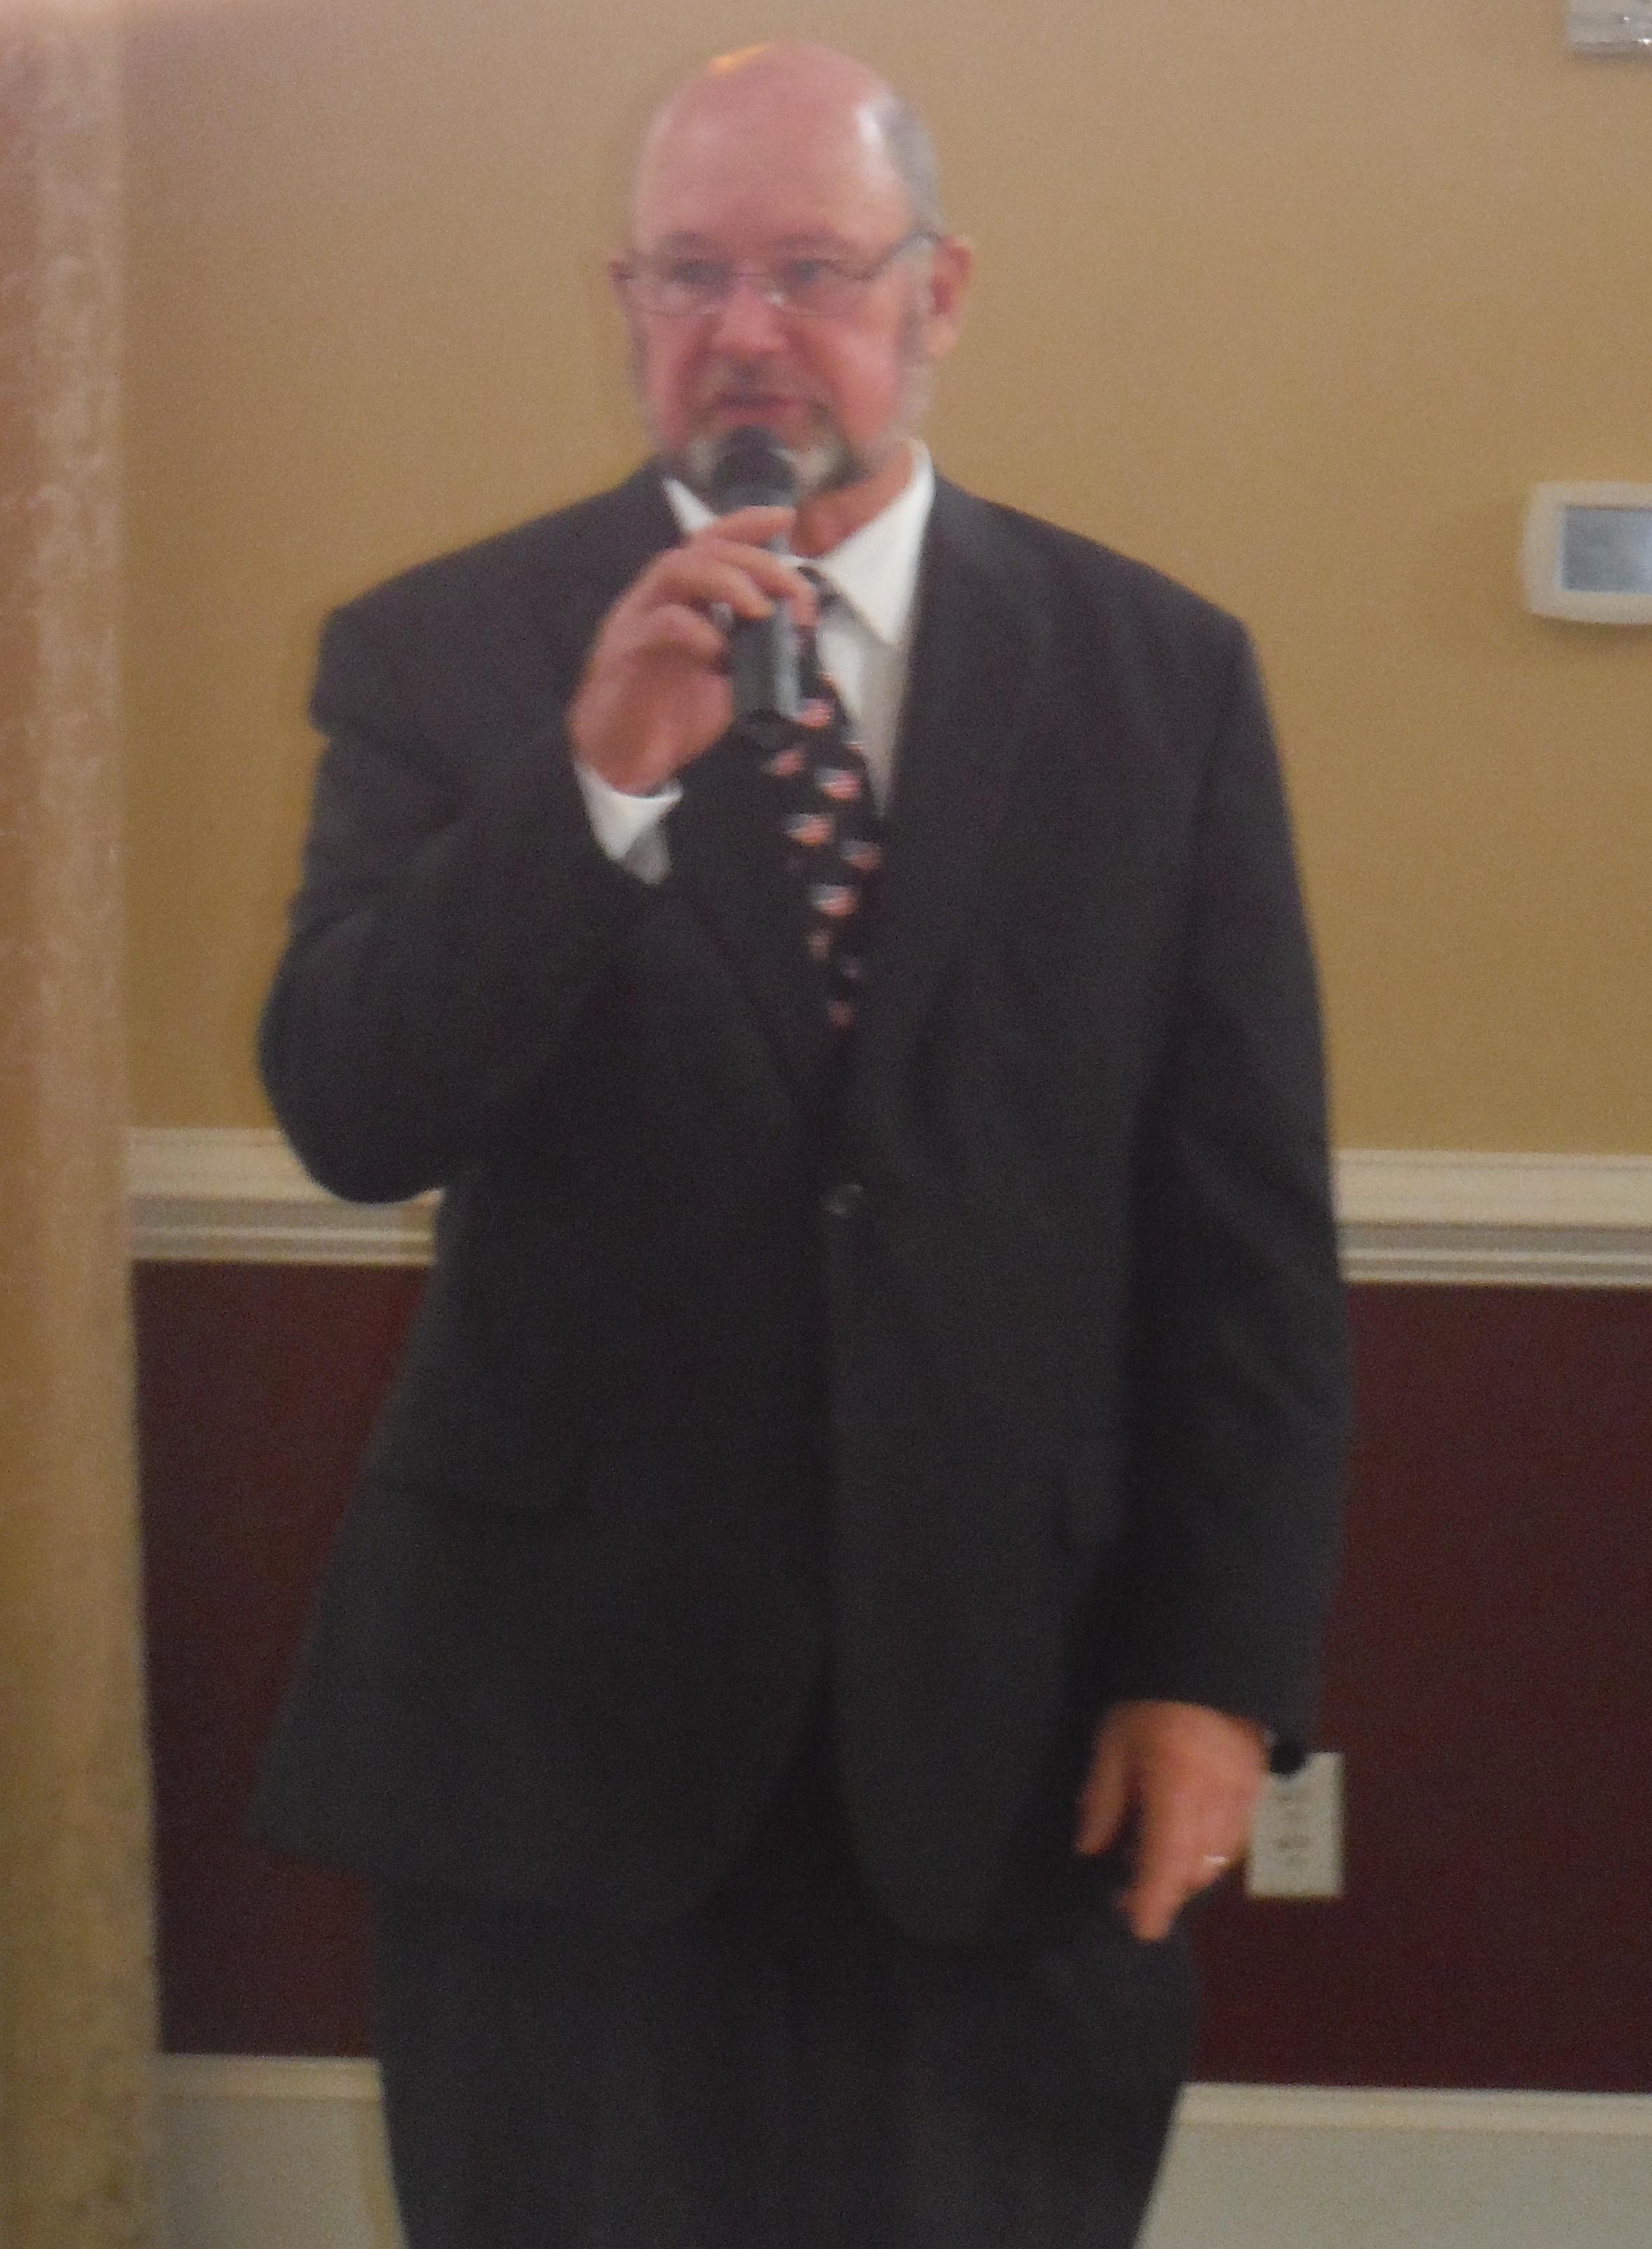 Senator Lawson Speaks at Noble's Pond Veteran's Day Celebration